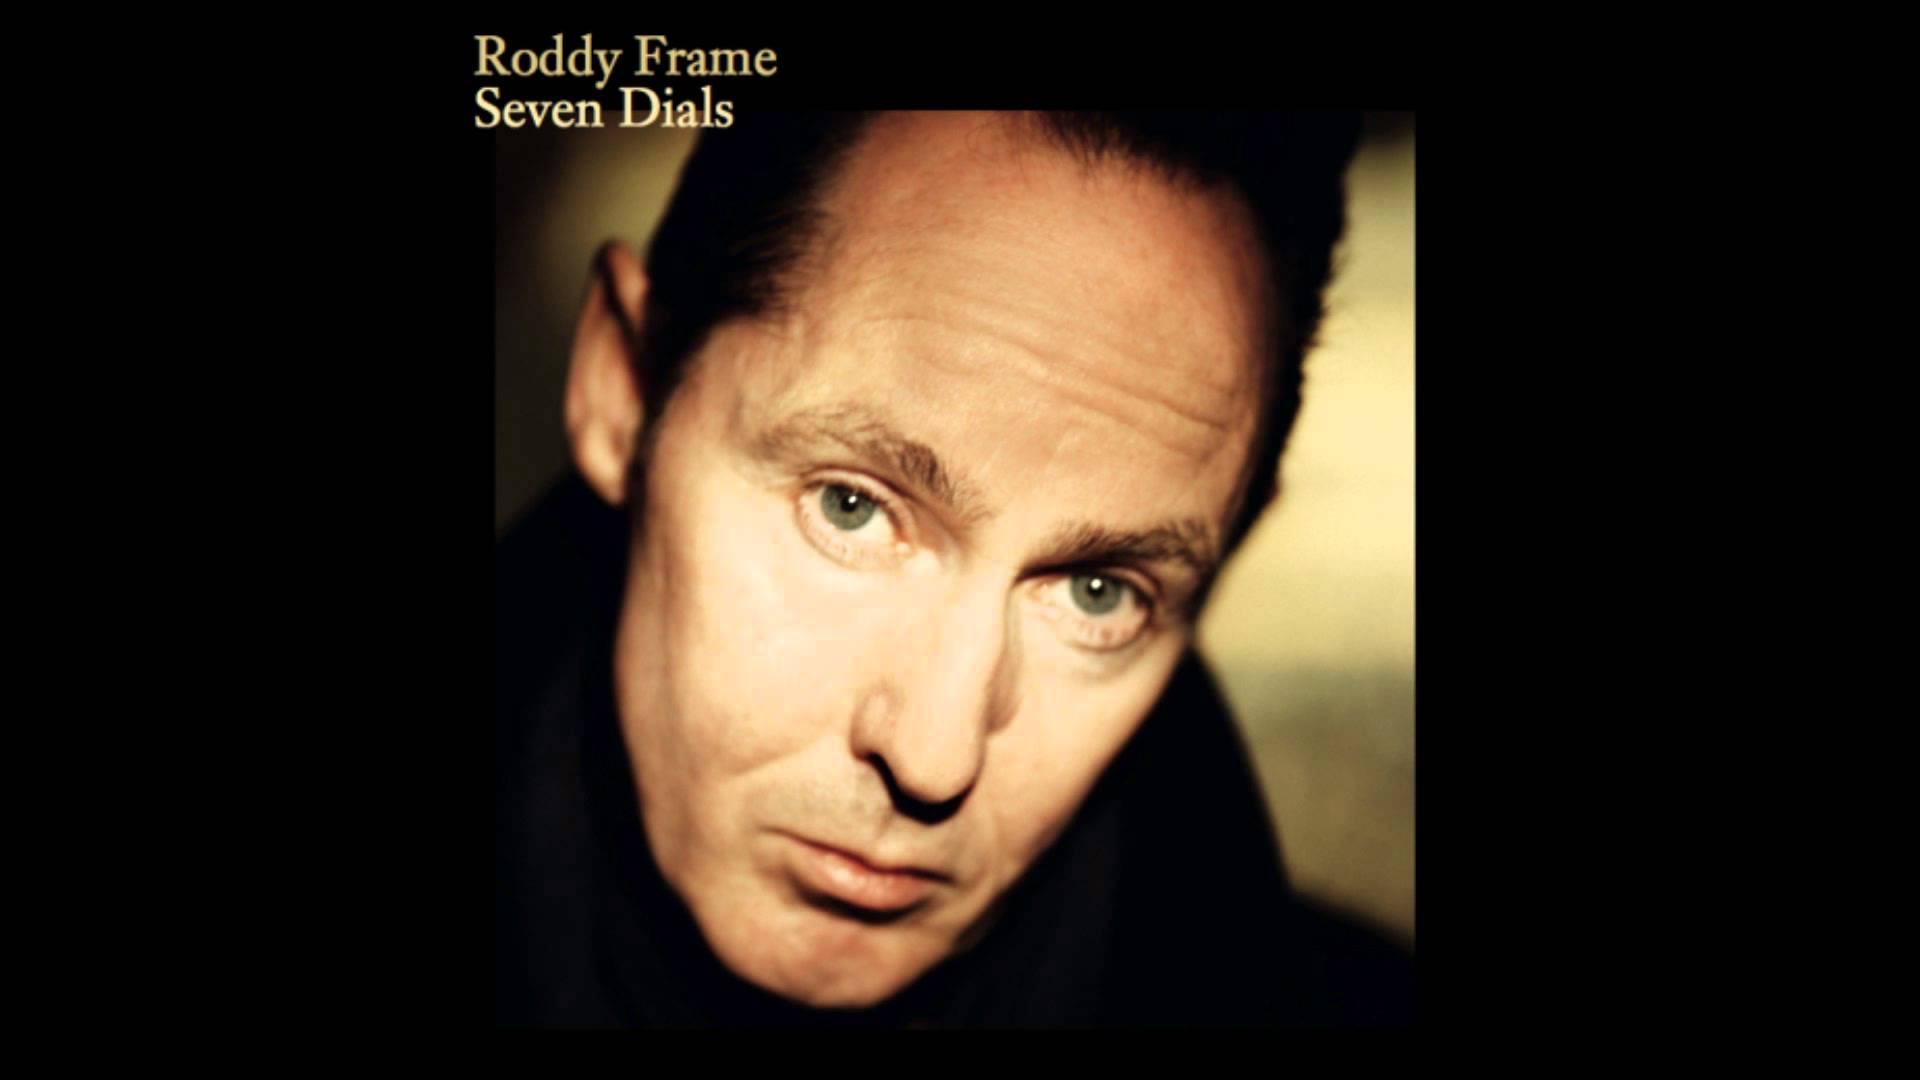 RODDY FRAME – BIRMINGHAM TOWN HALL